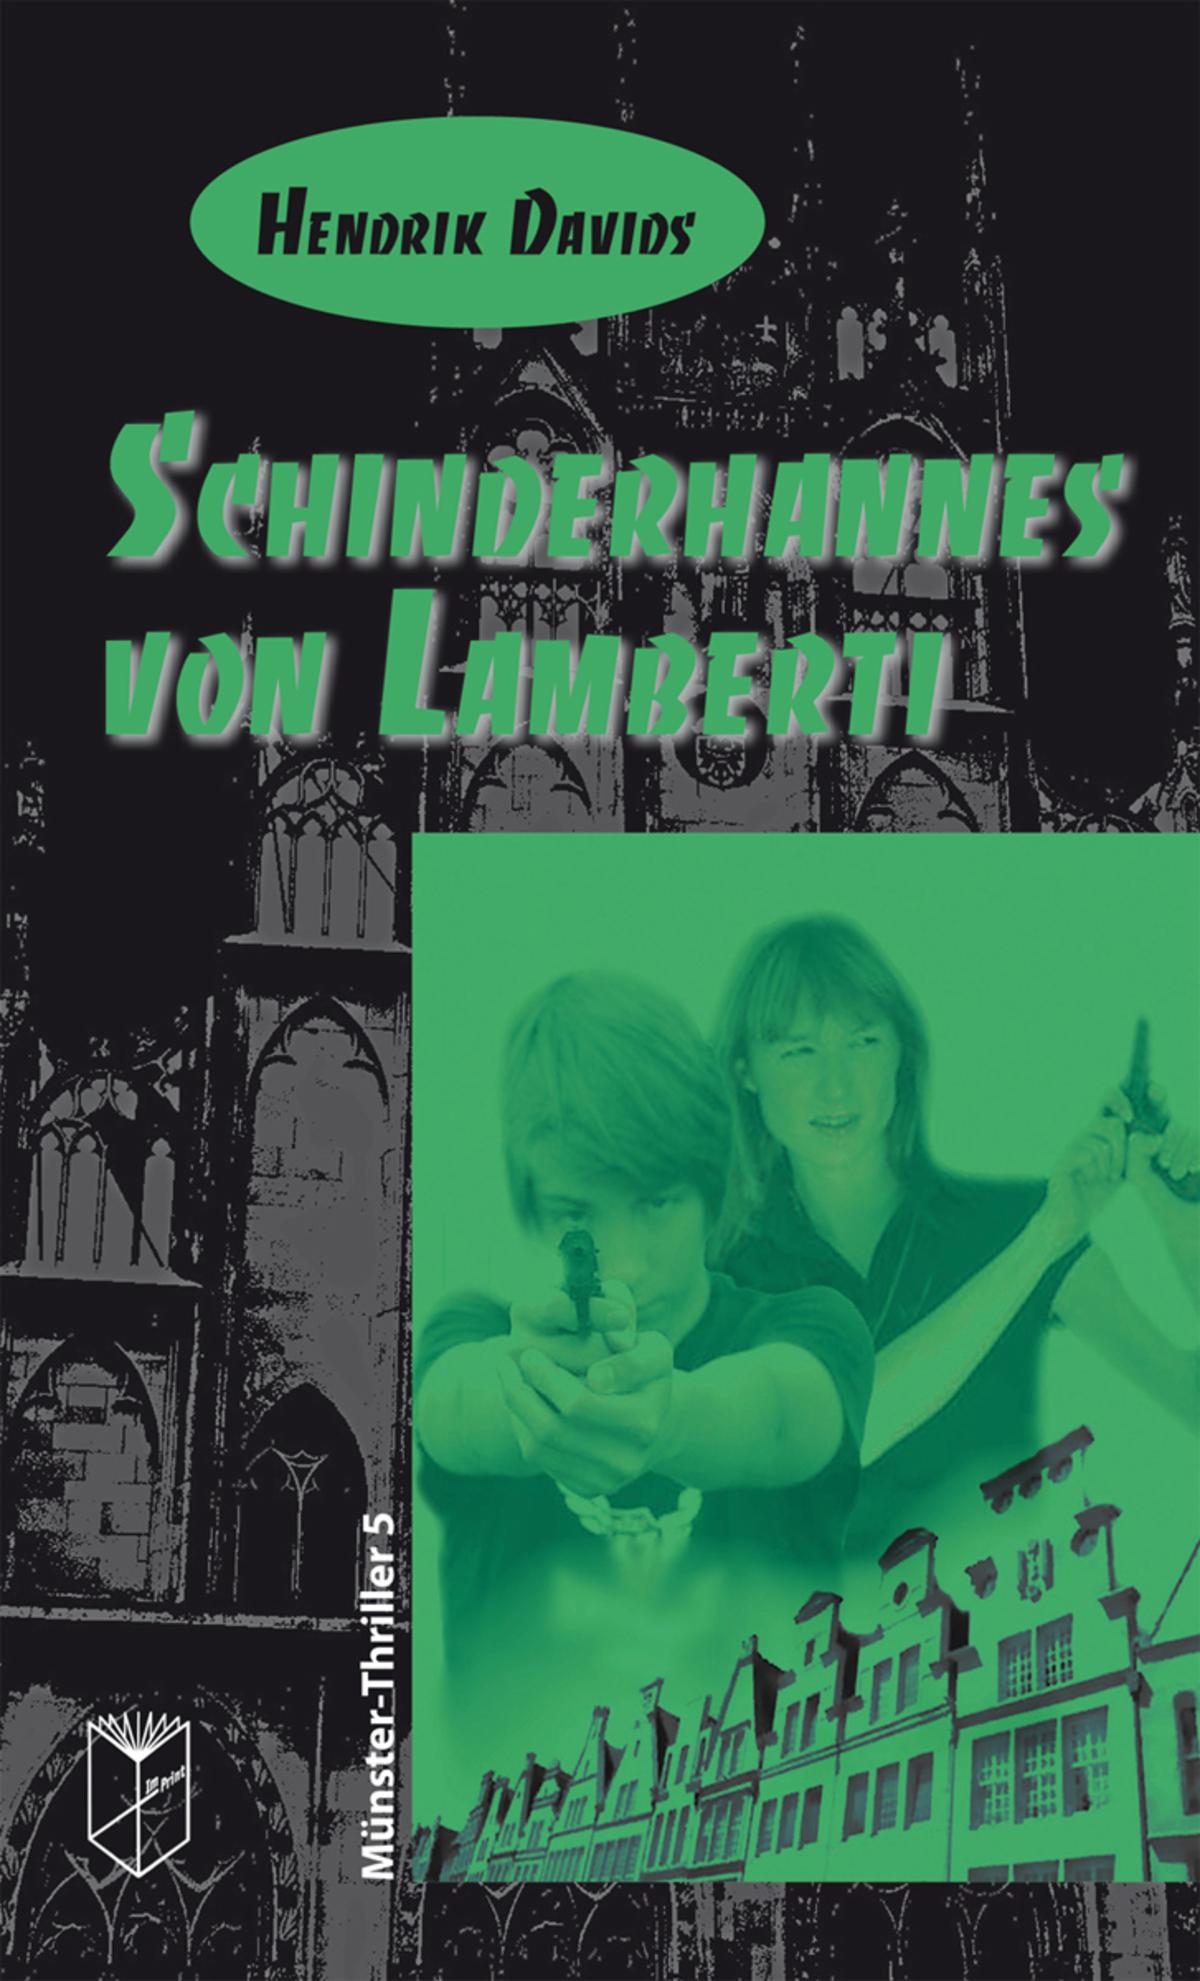 Hendrik Davids Schinderhannes von Lamberti зонт lamberti 73920